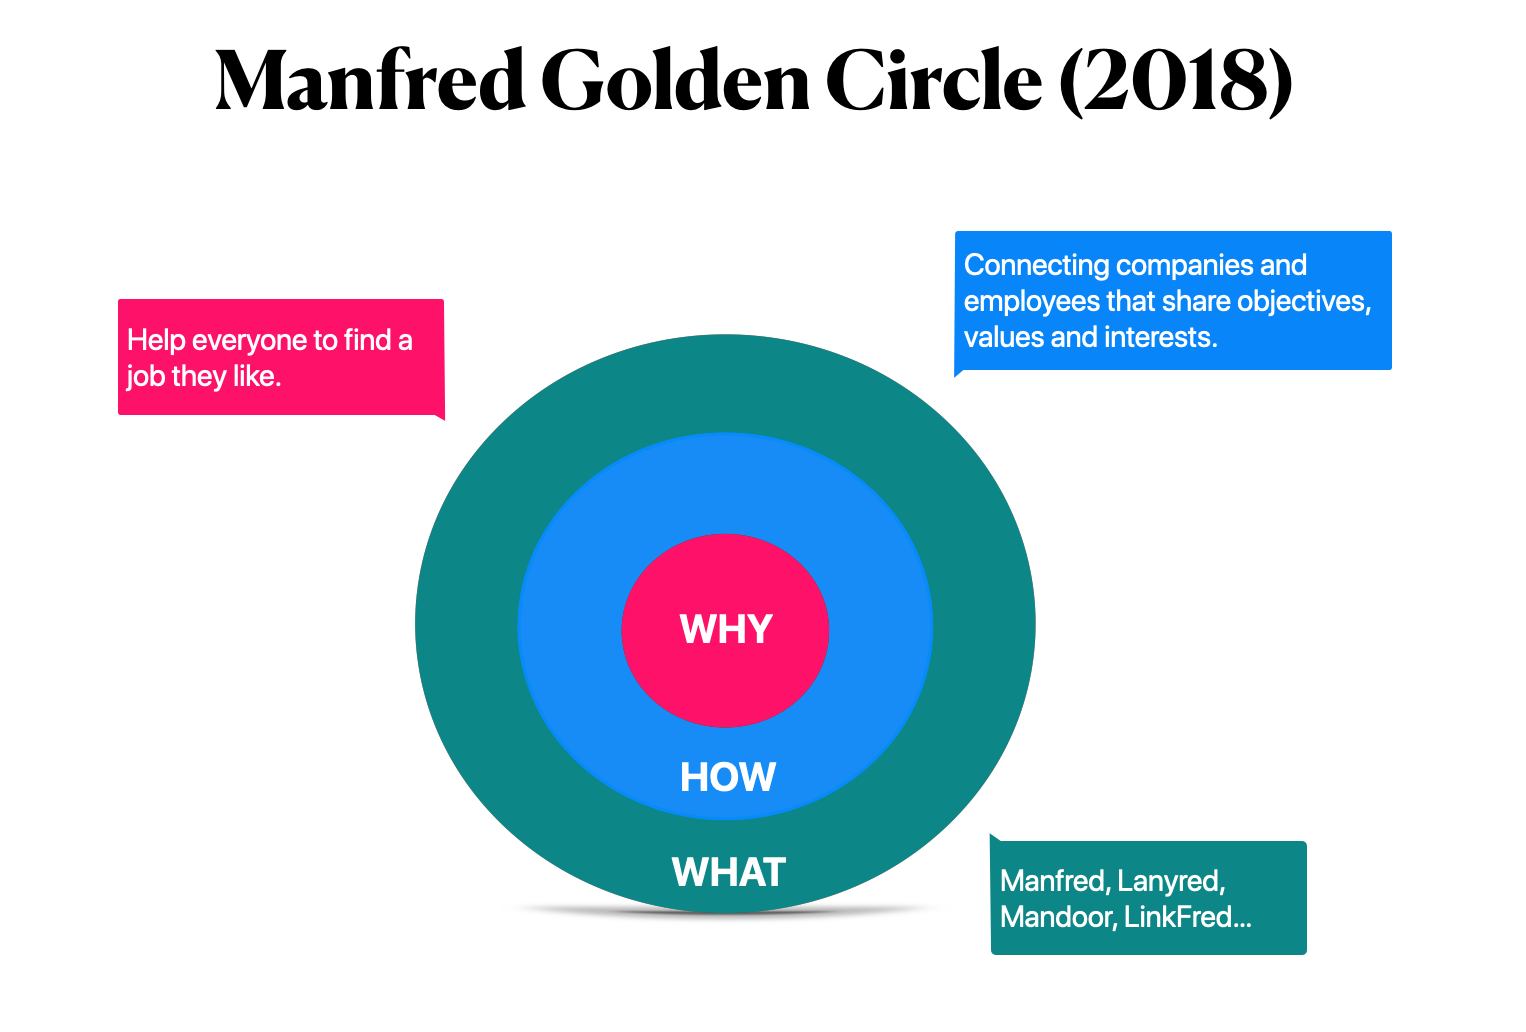 Manfred Golden Circle